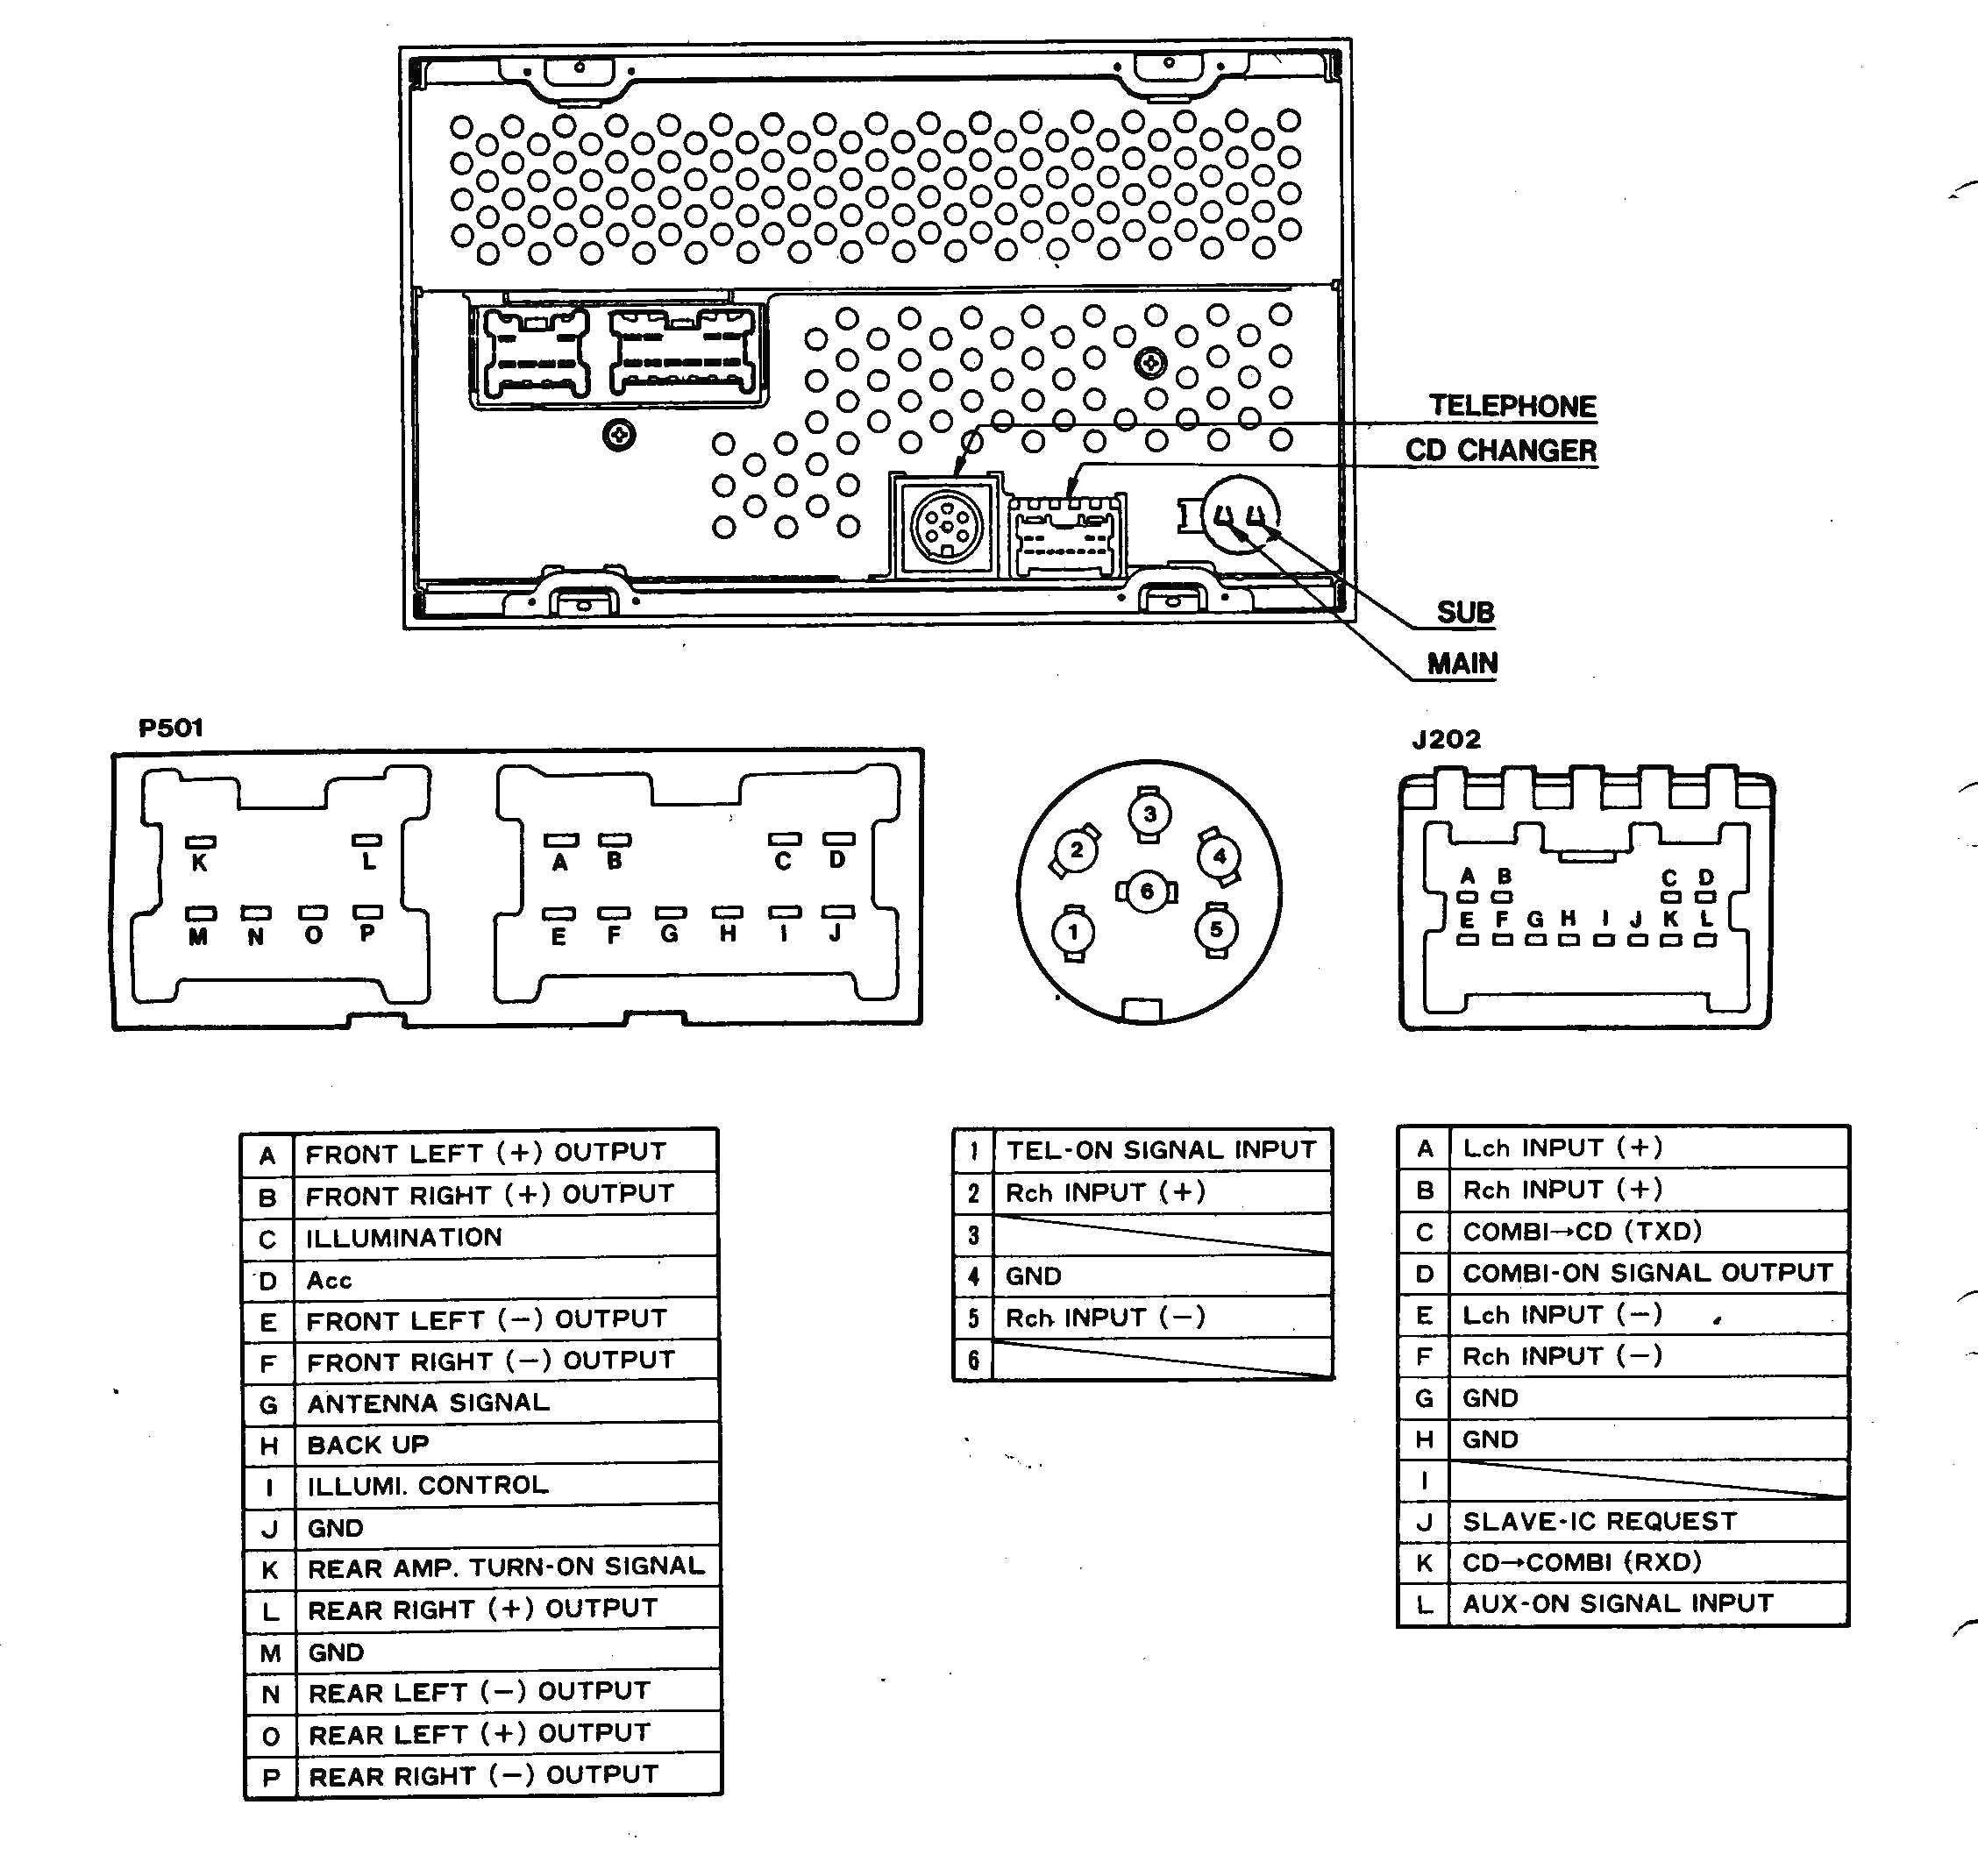 Nissan Almera 2003 Radio Diagram B8185-8m00 Nissan Car Wiring Color Code M3 E46 Glove Box Fuse Panel Of Nissan Almera 2003 Radio Diagram B8185-8m00